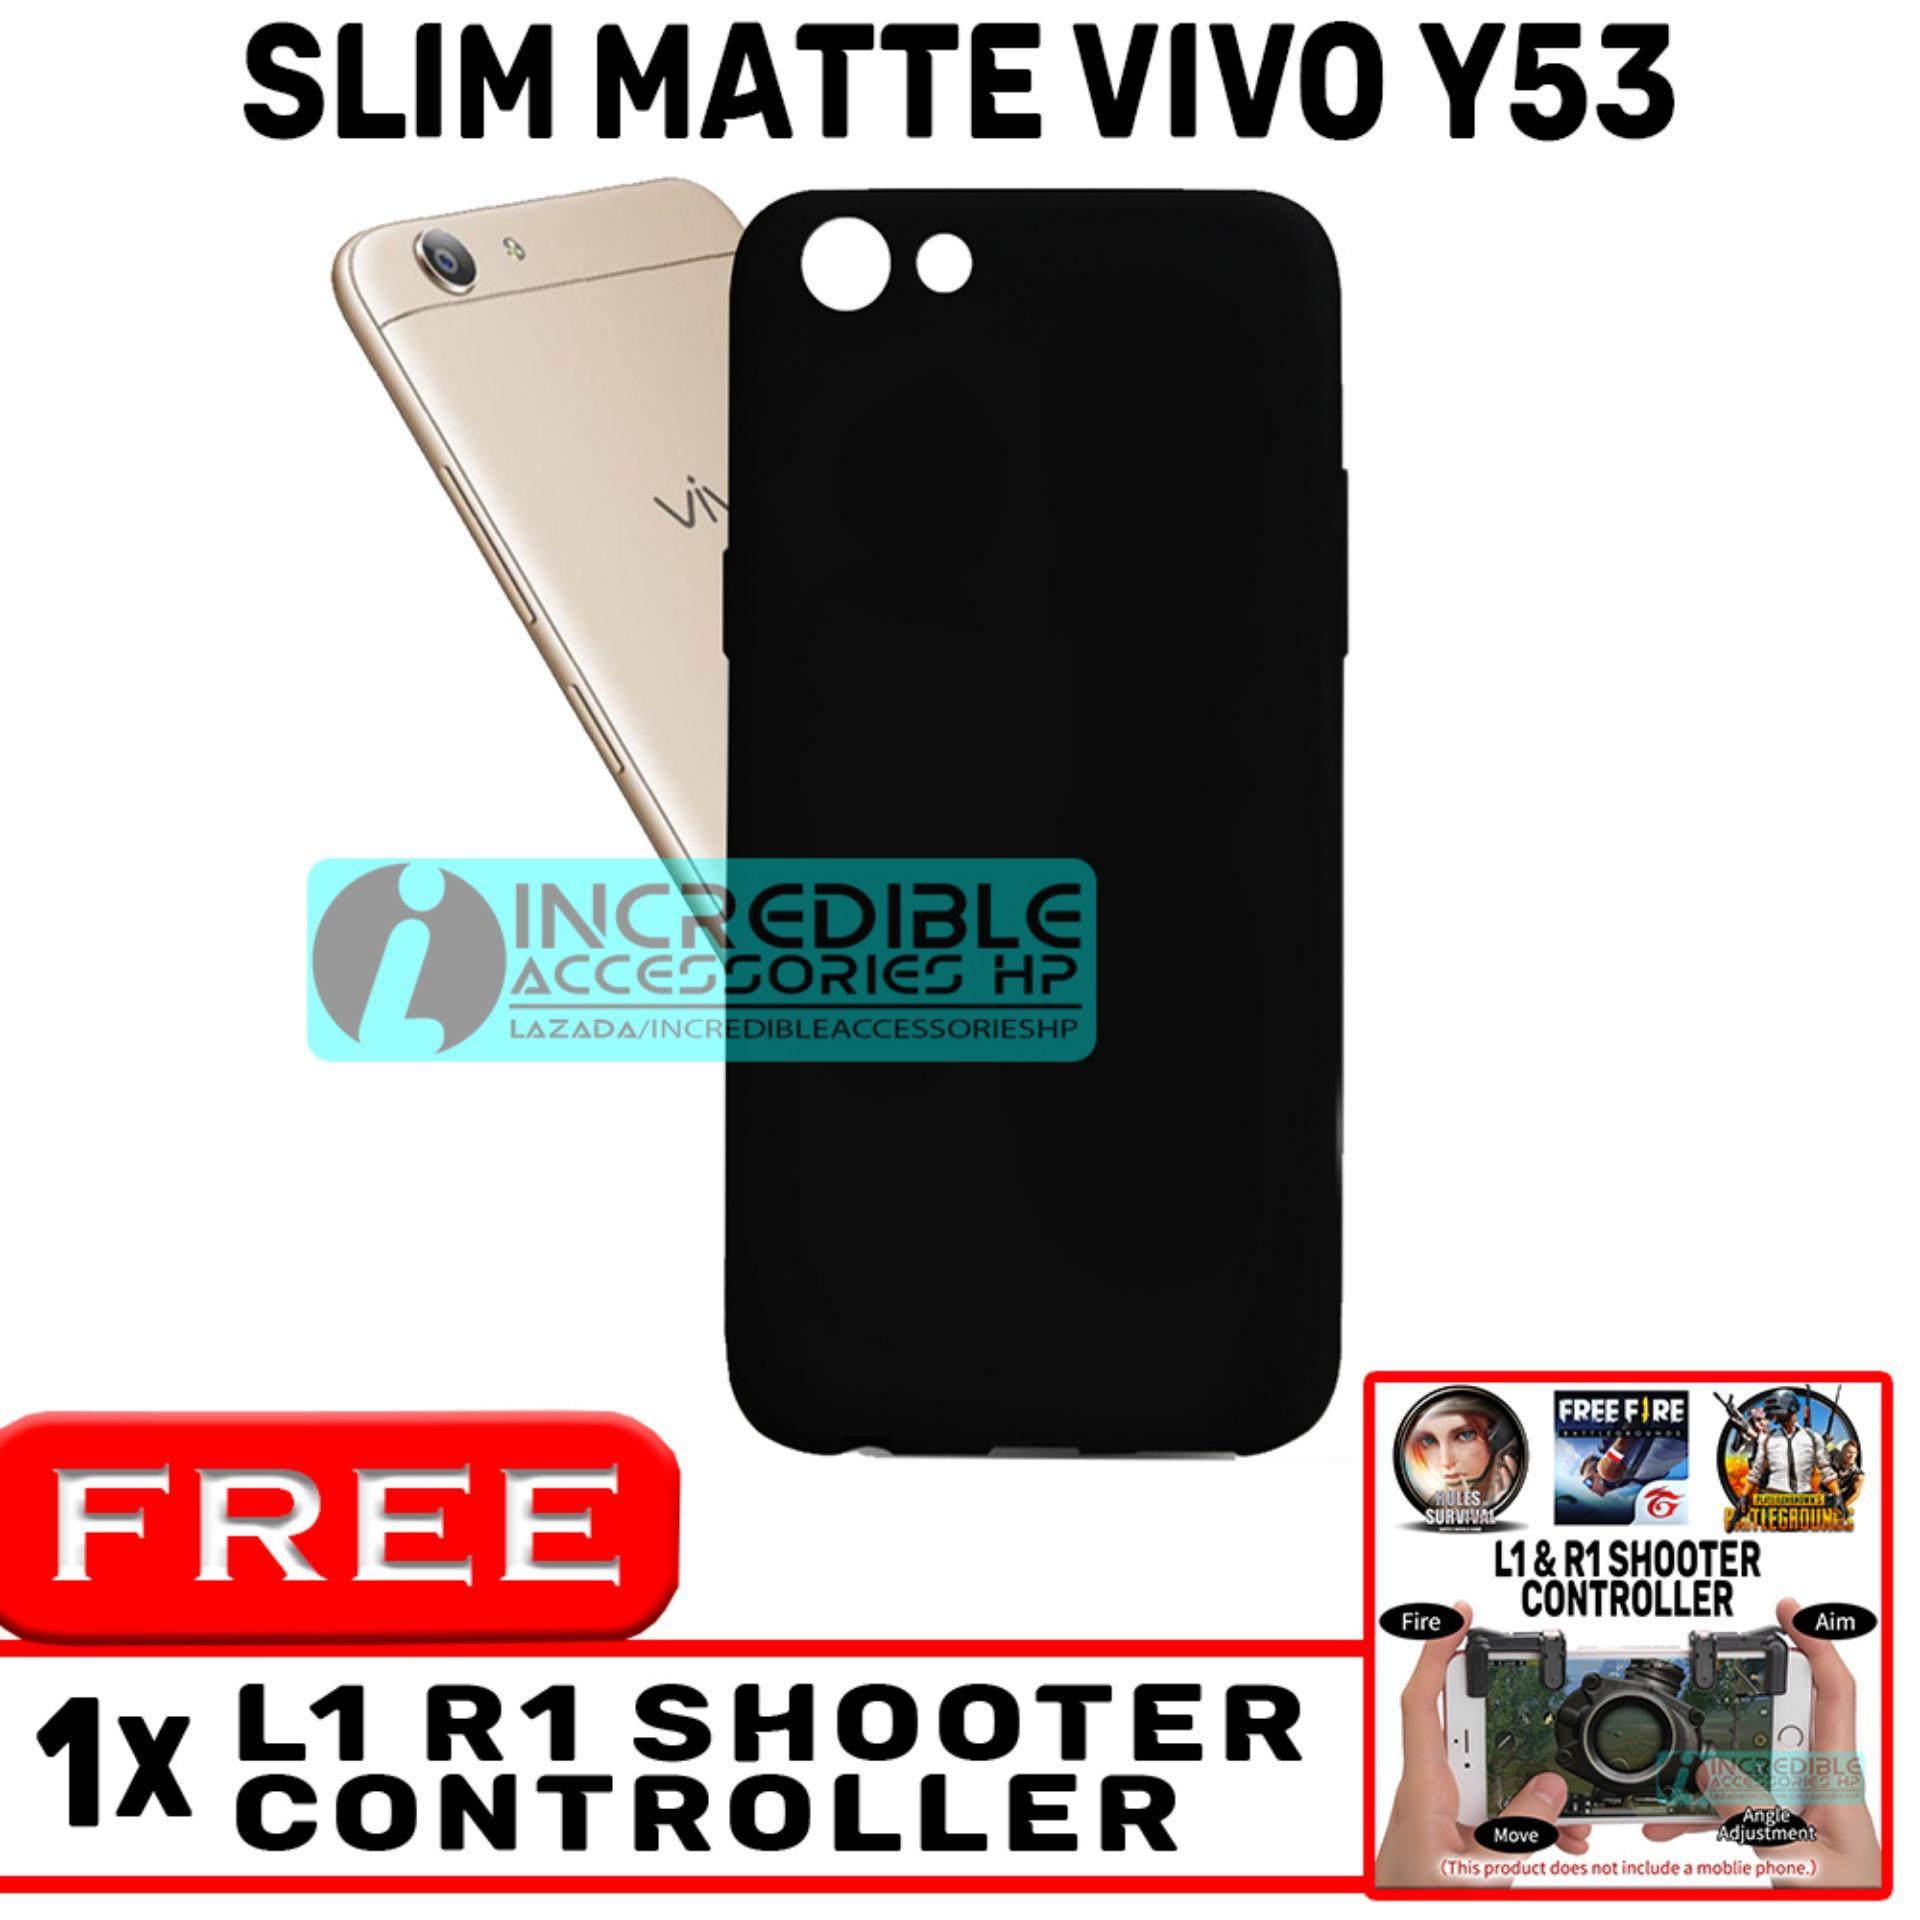 Slim Matte for Vivo Y53 Softcase Baby Skin Black Matte High Quality - Black + Free Tombol L1 R1 Untuk Main PUBG Mobile